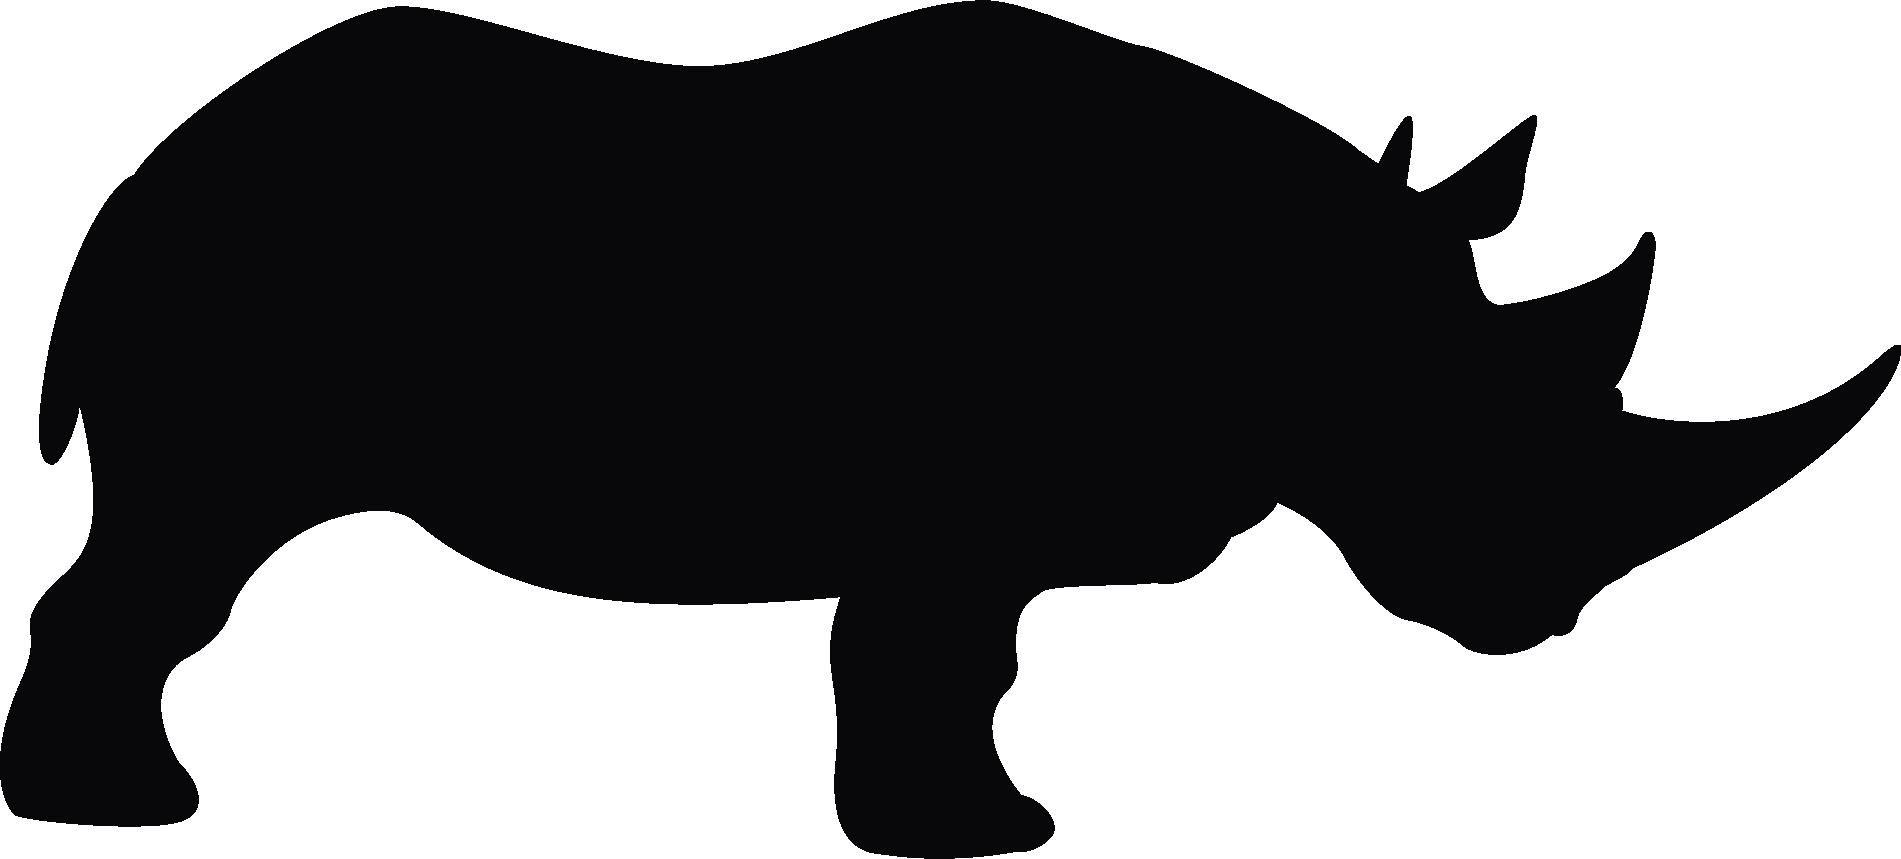 jpg black and white Rhino Head Silhouette at GetDrawings